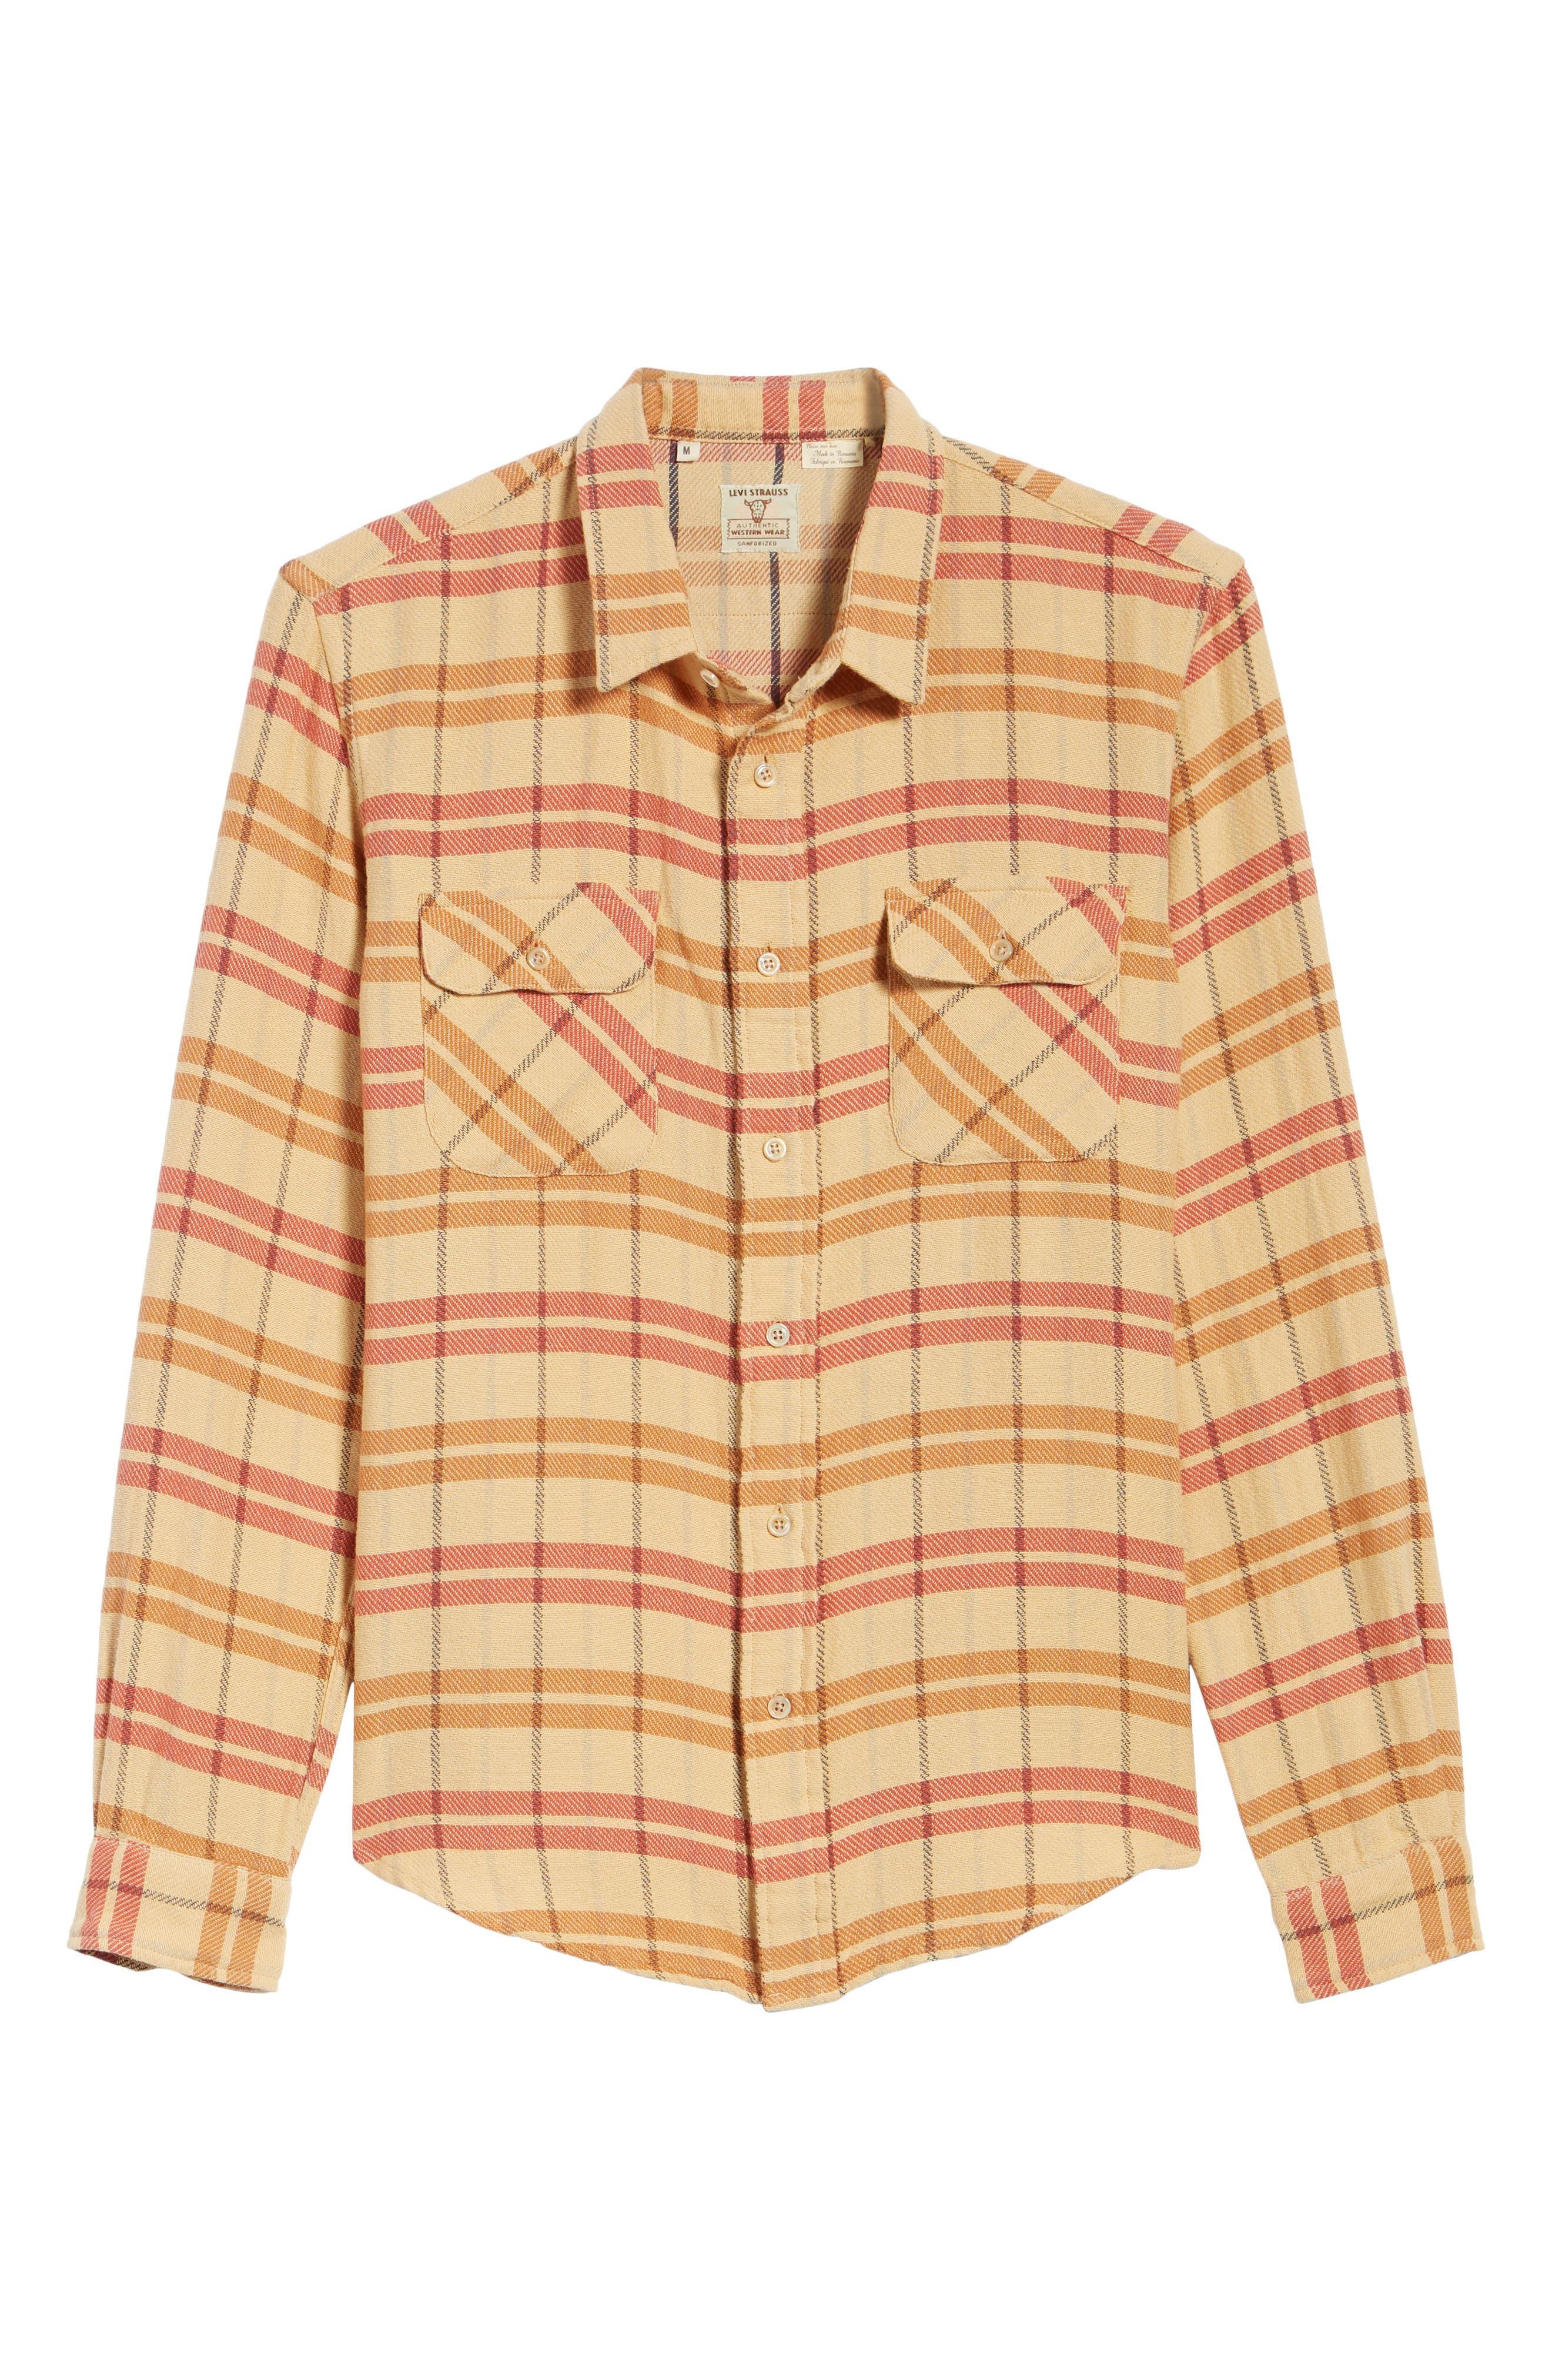 Shorthorn Western Shirt,                             Alternate thumbnail 6, color,                             Sunfaded Orange